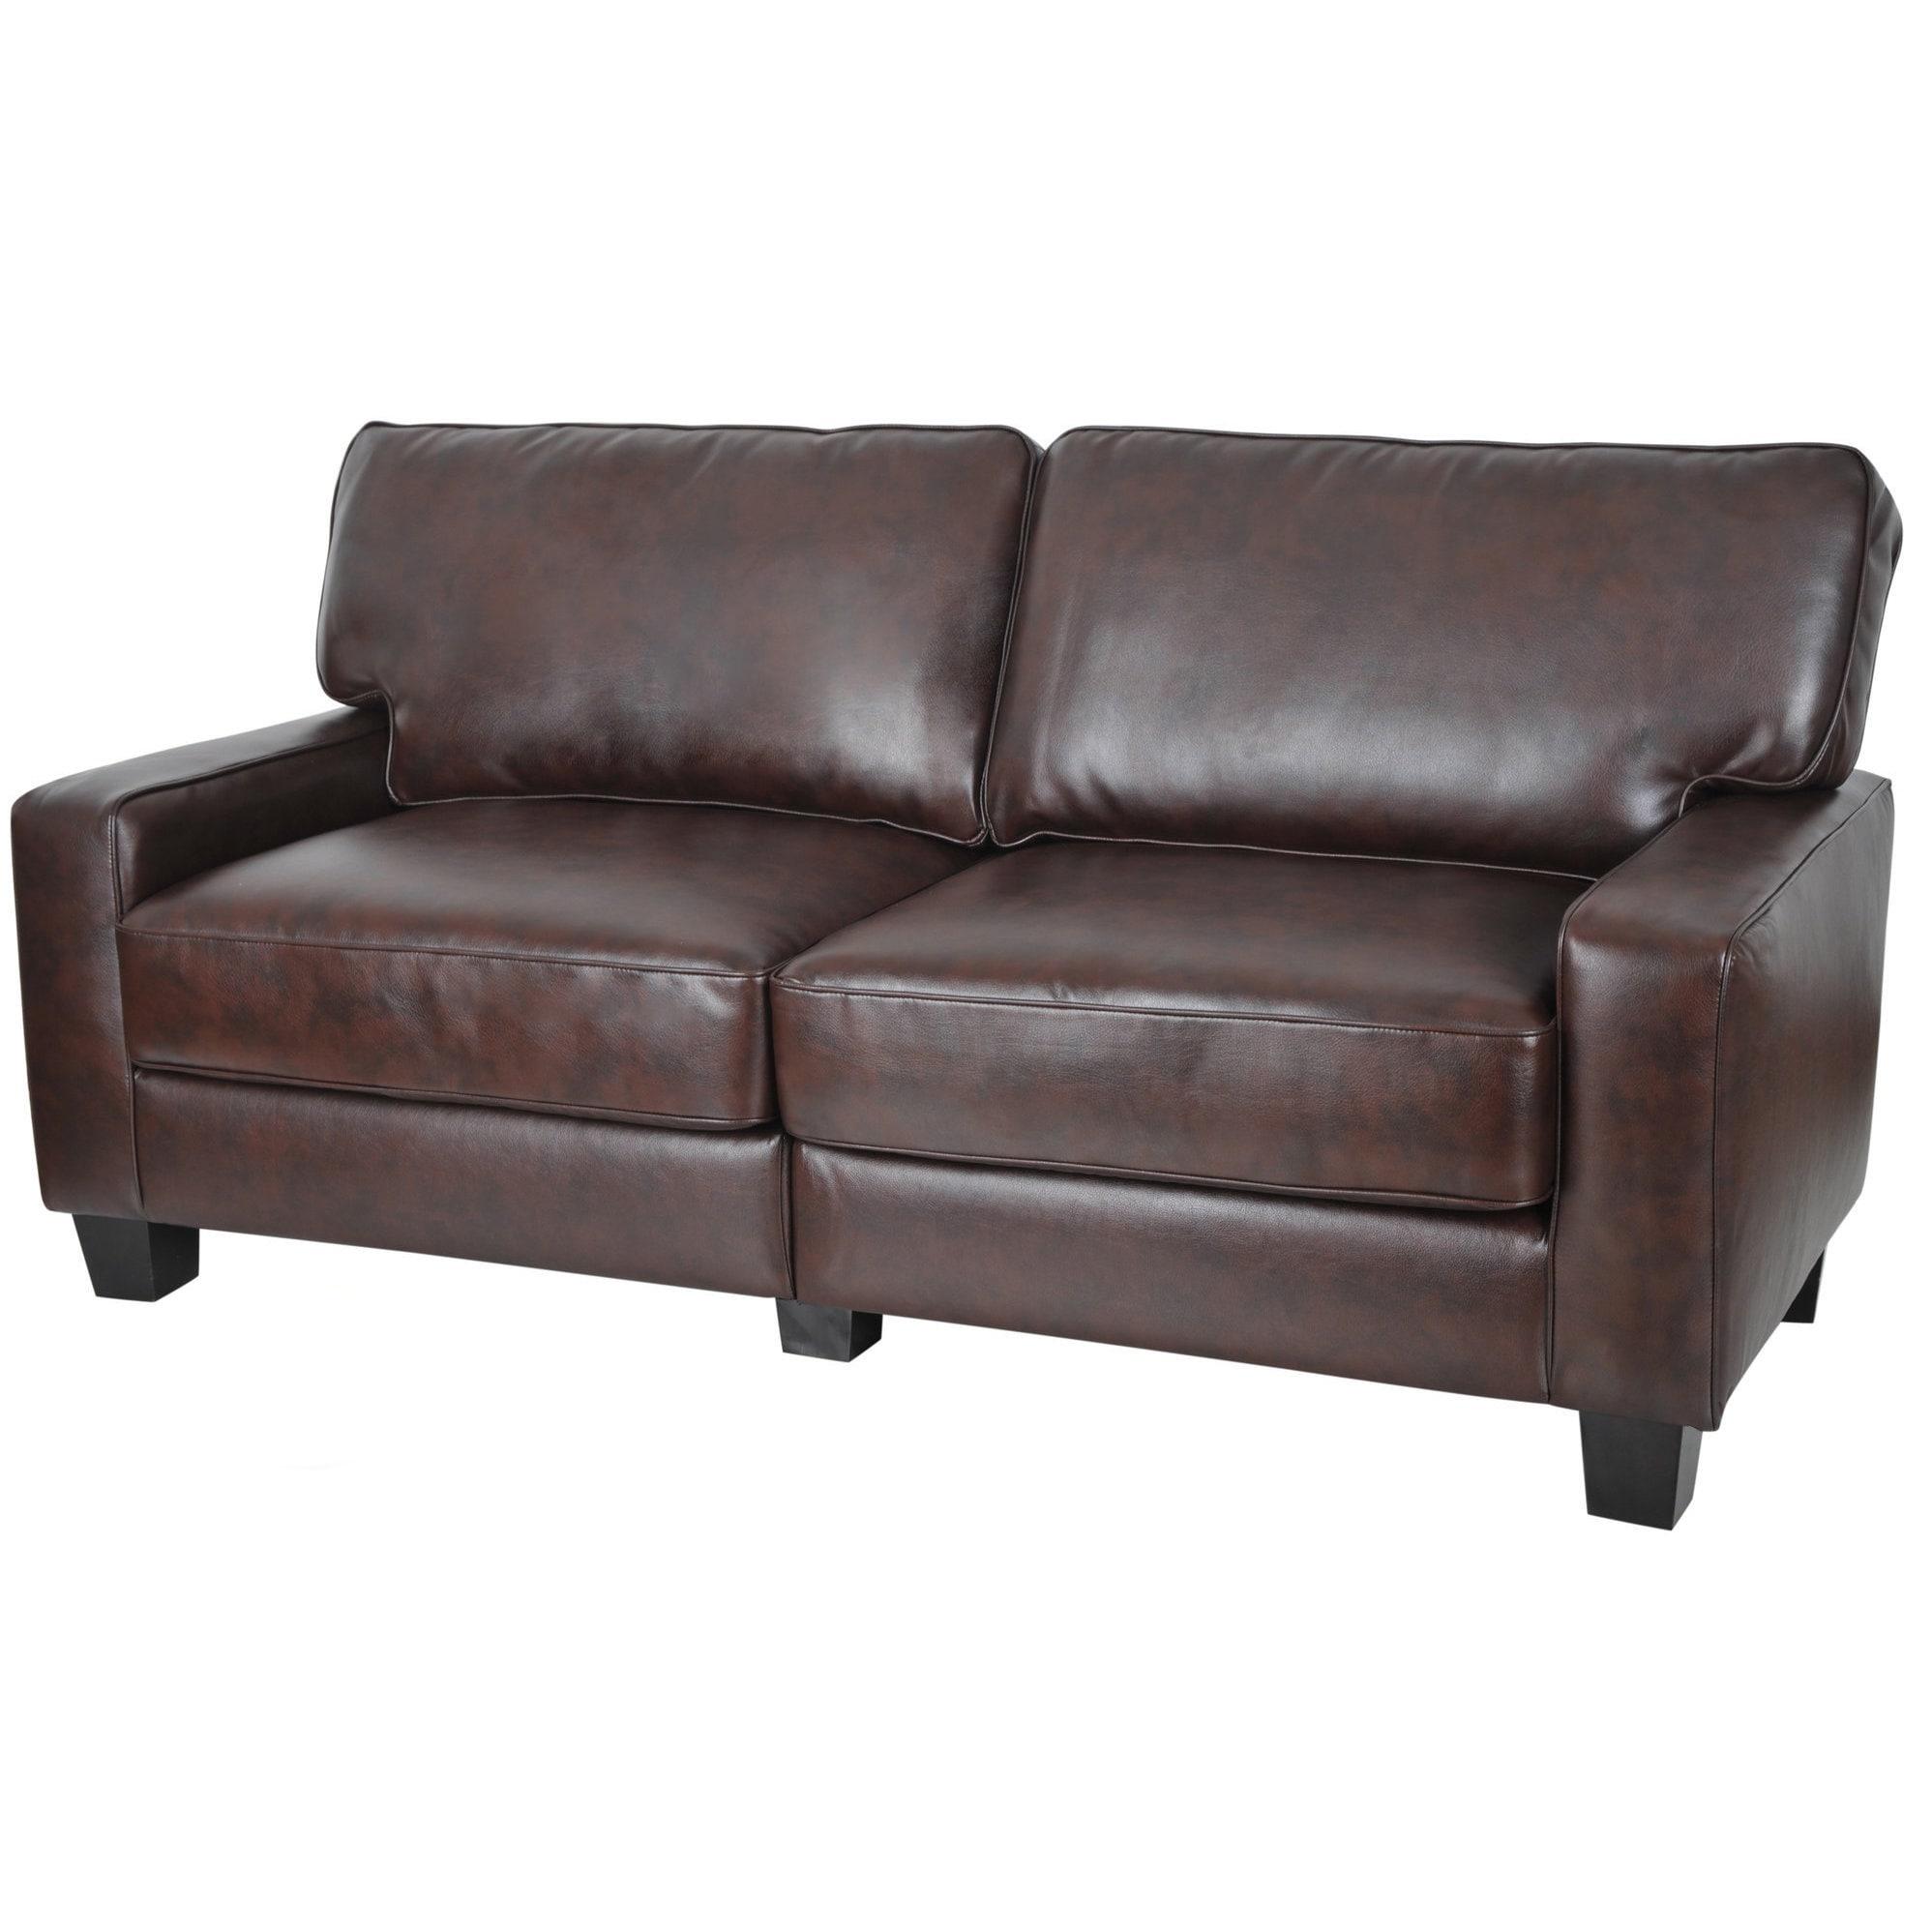 Shop Serta Rta Monaco Collection 72 Inch Brown Leather Sofa Free